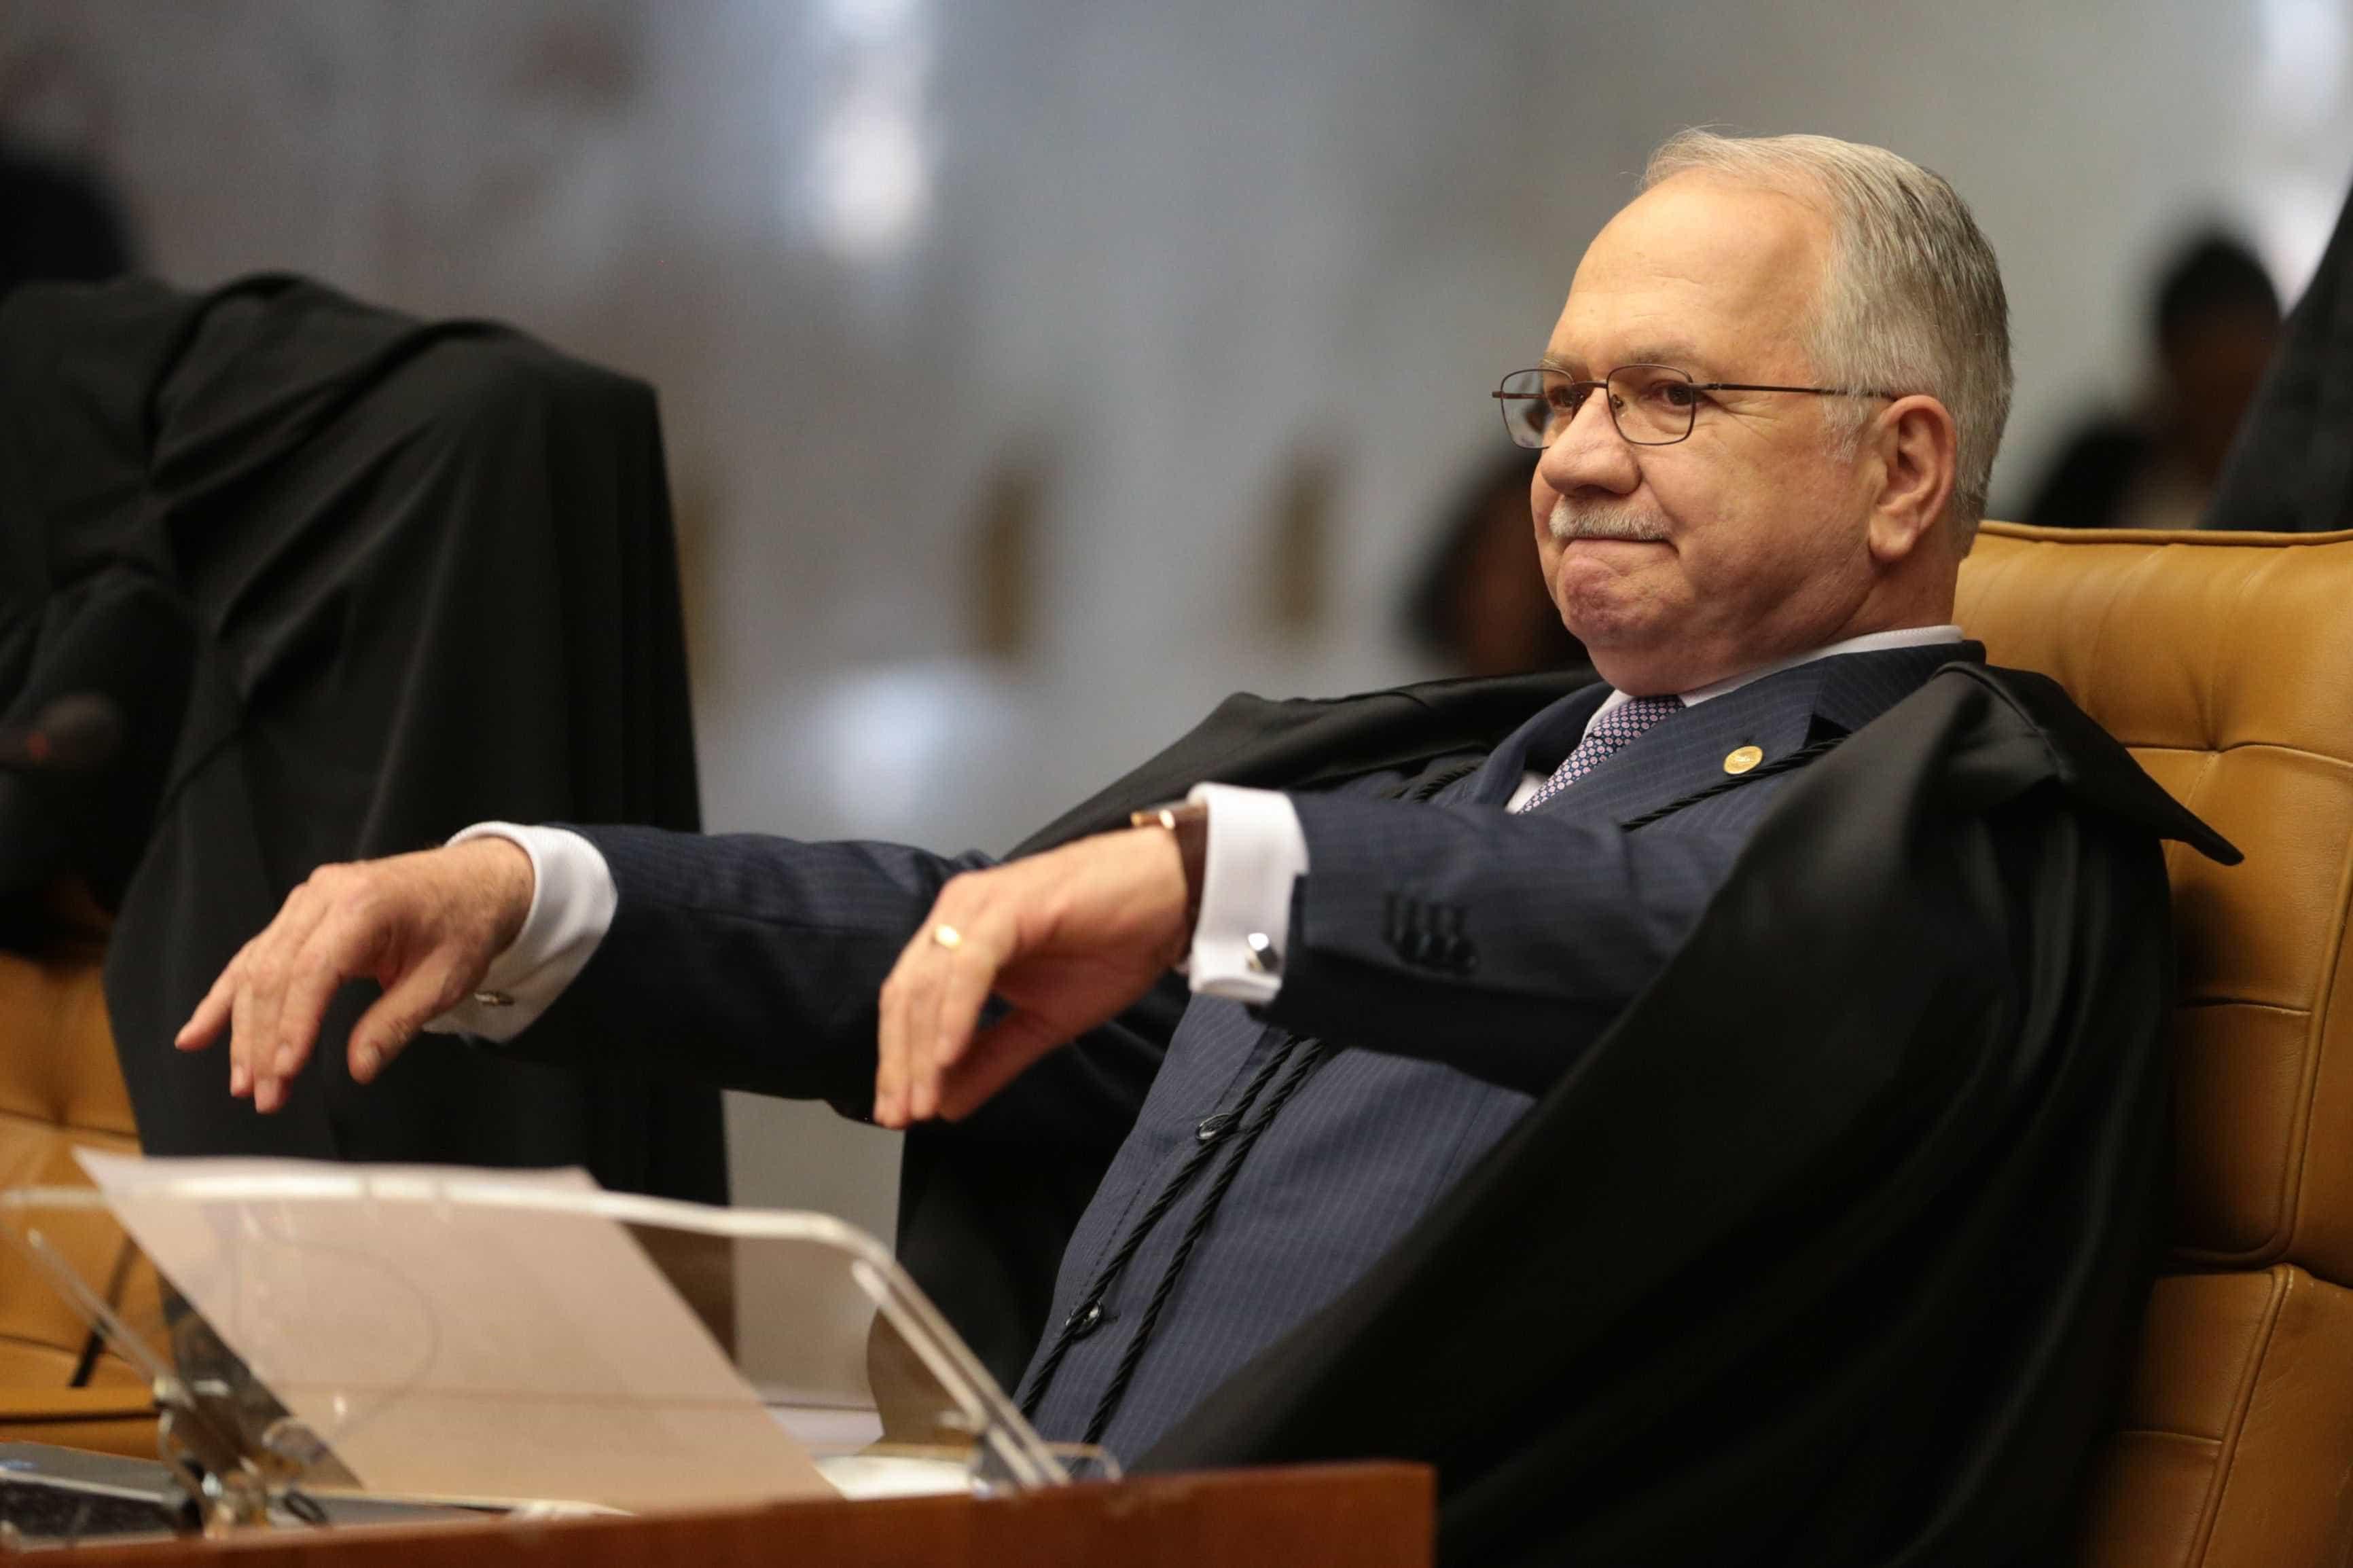 Fachin: julgamento de habeas corpus de Lula deve ser concluído dia 4